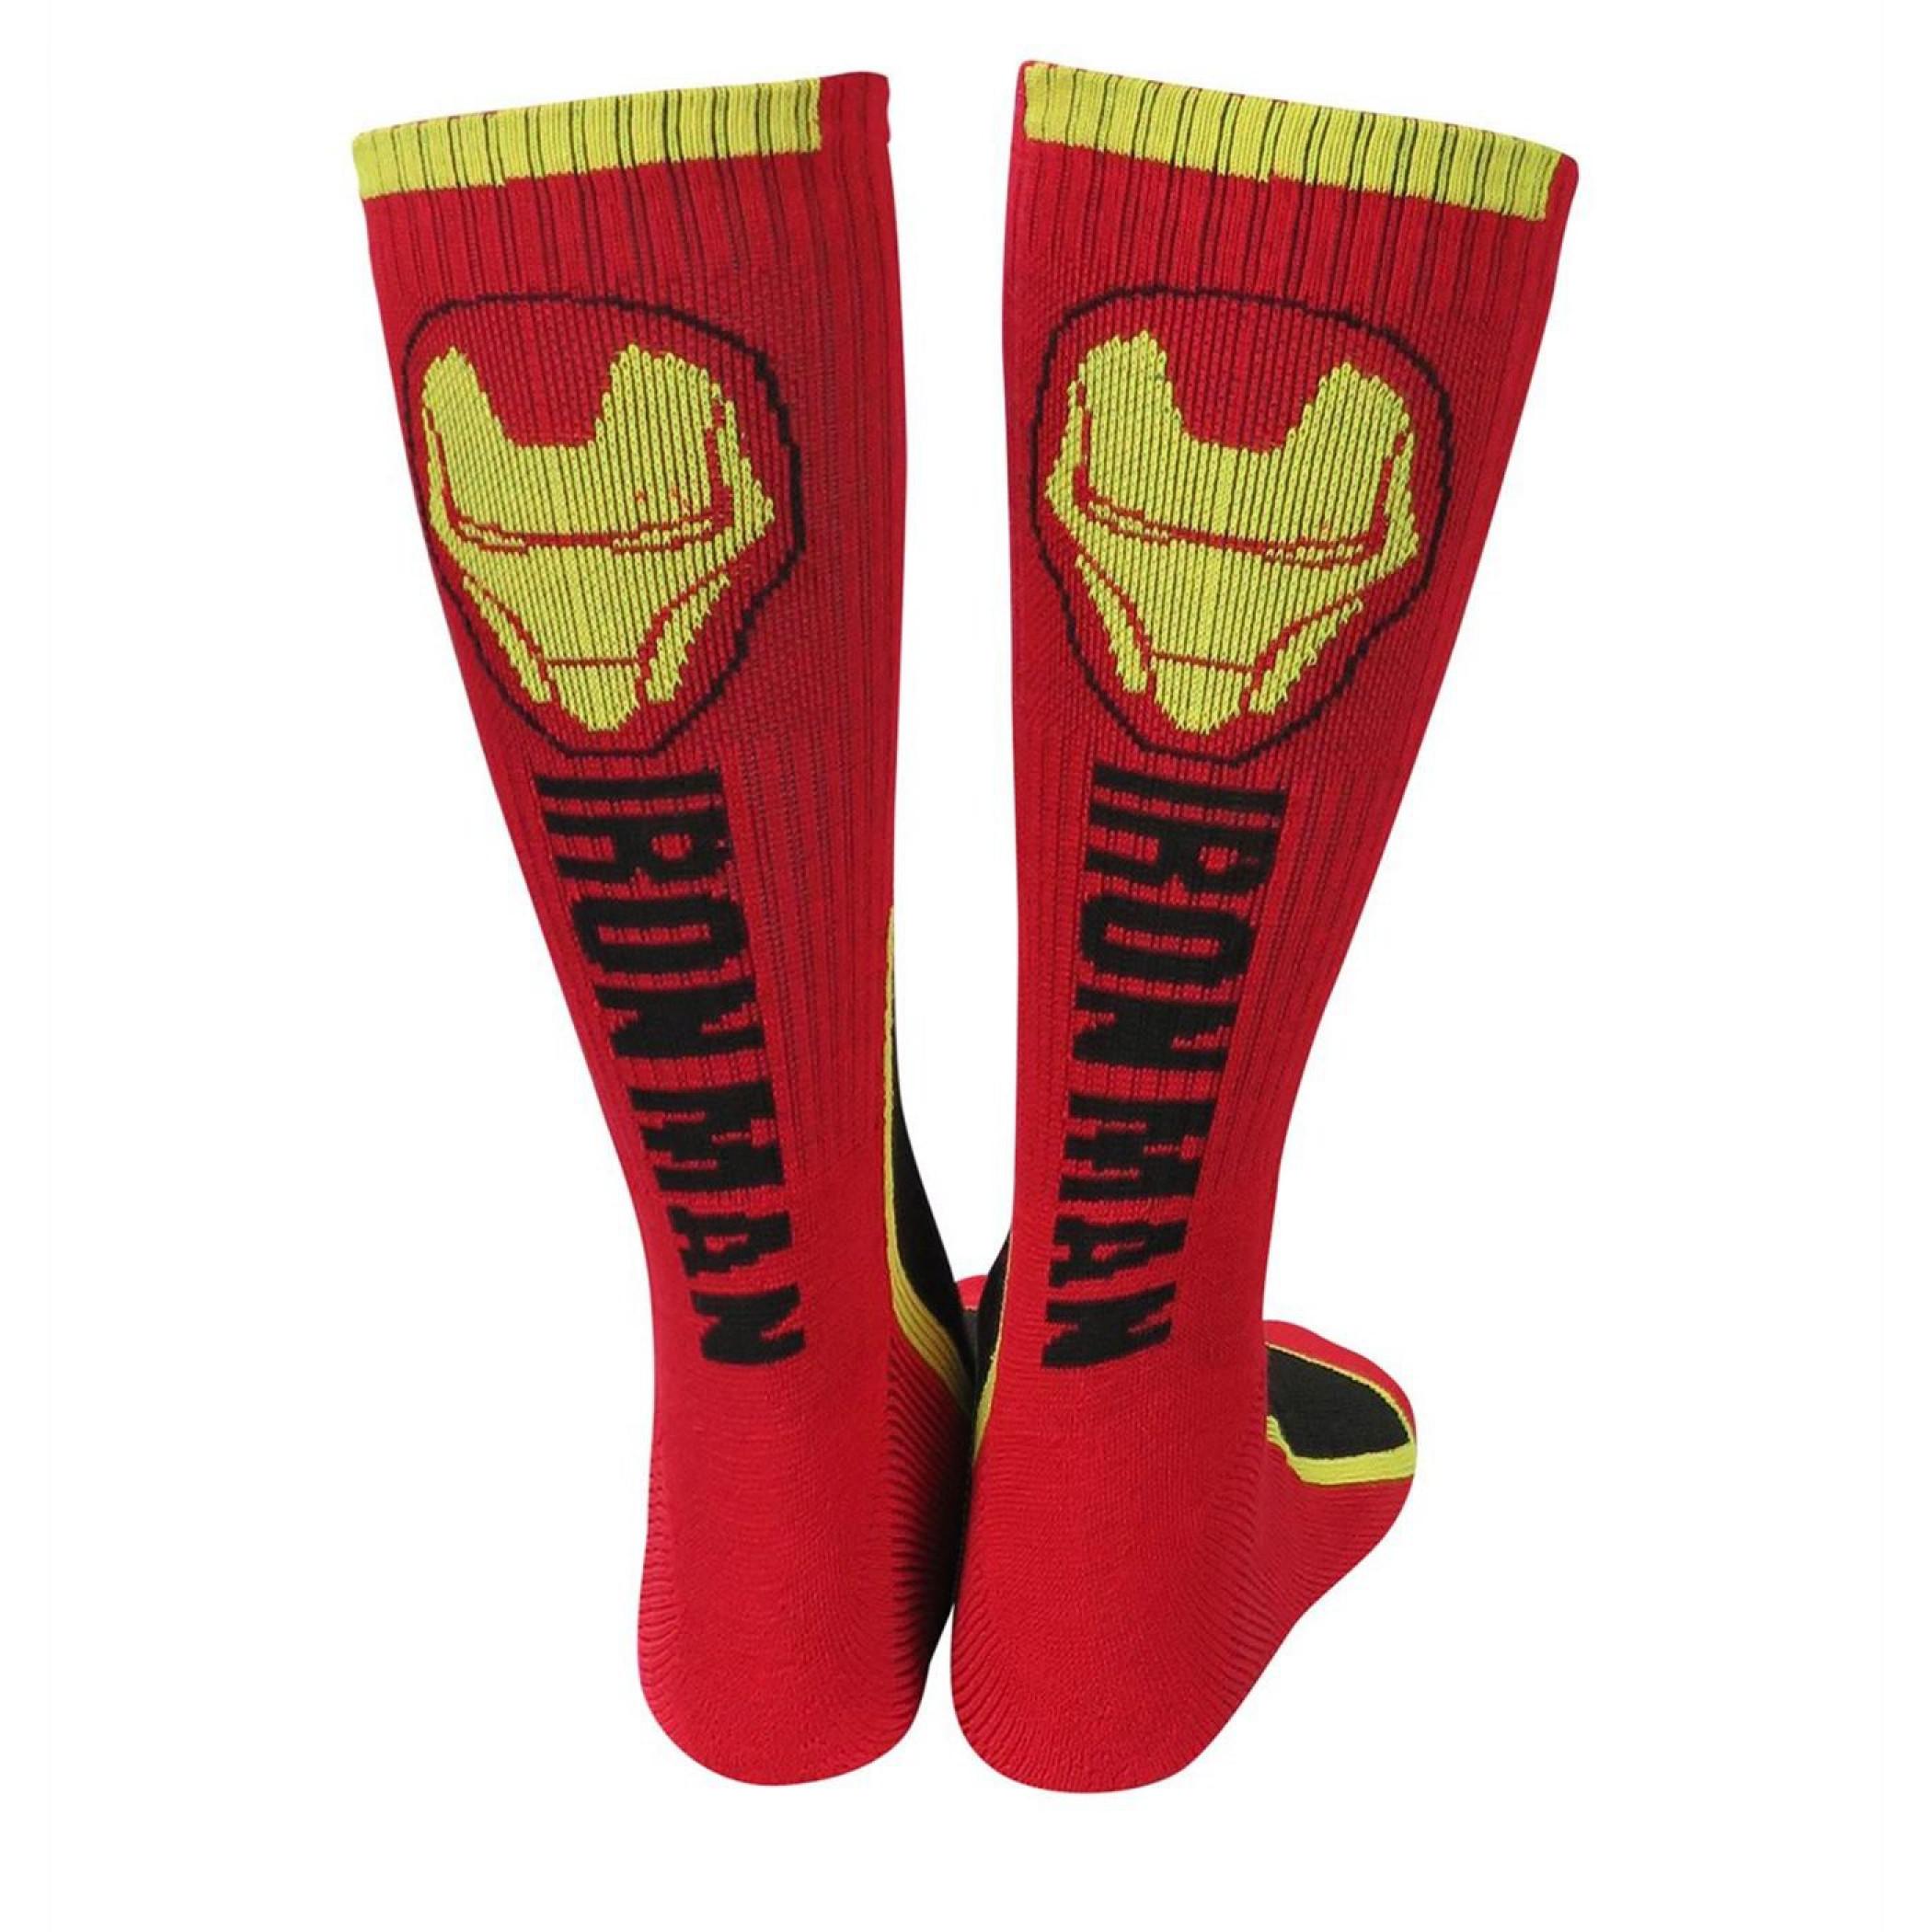 Iron Man Helmet and Stark Industries Crew Socks 2-Pair Pack